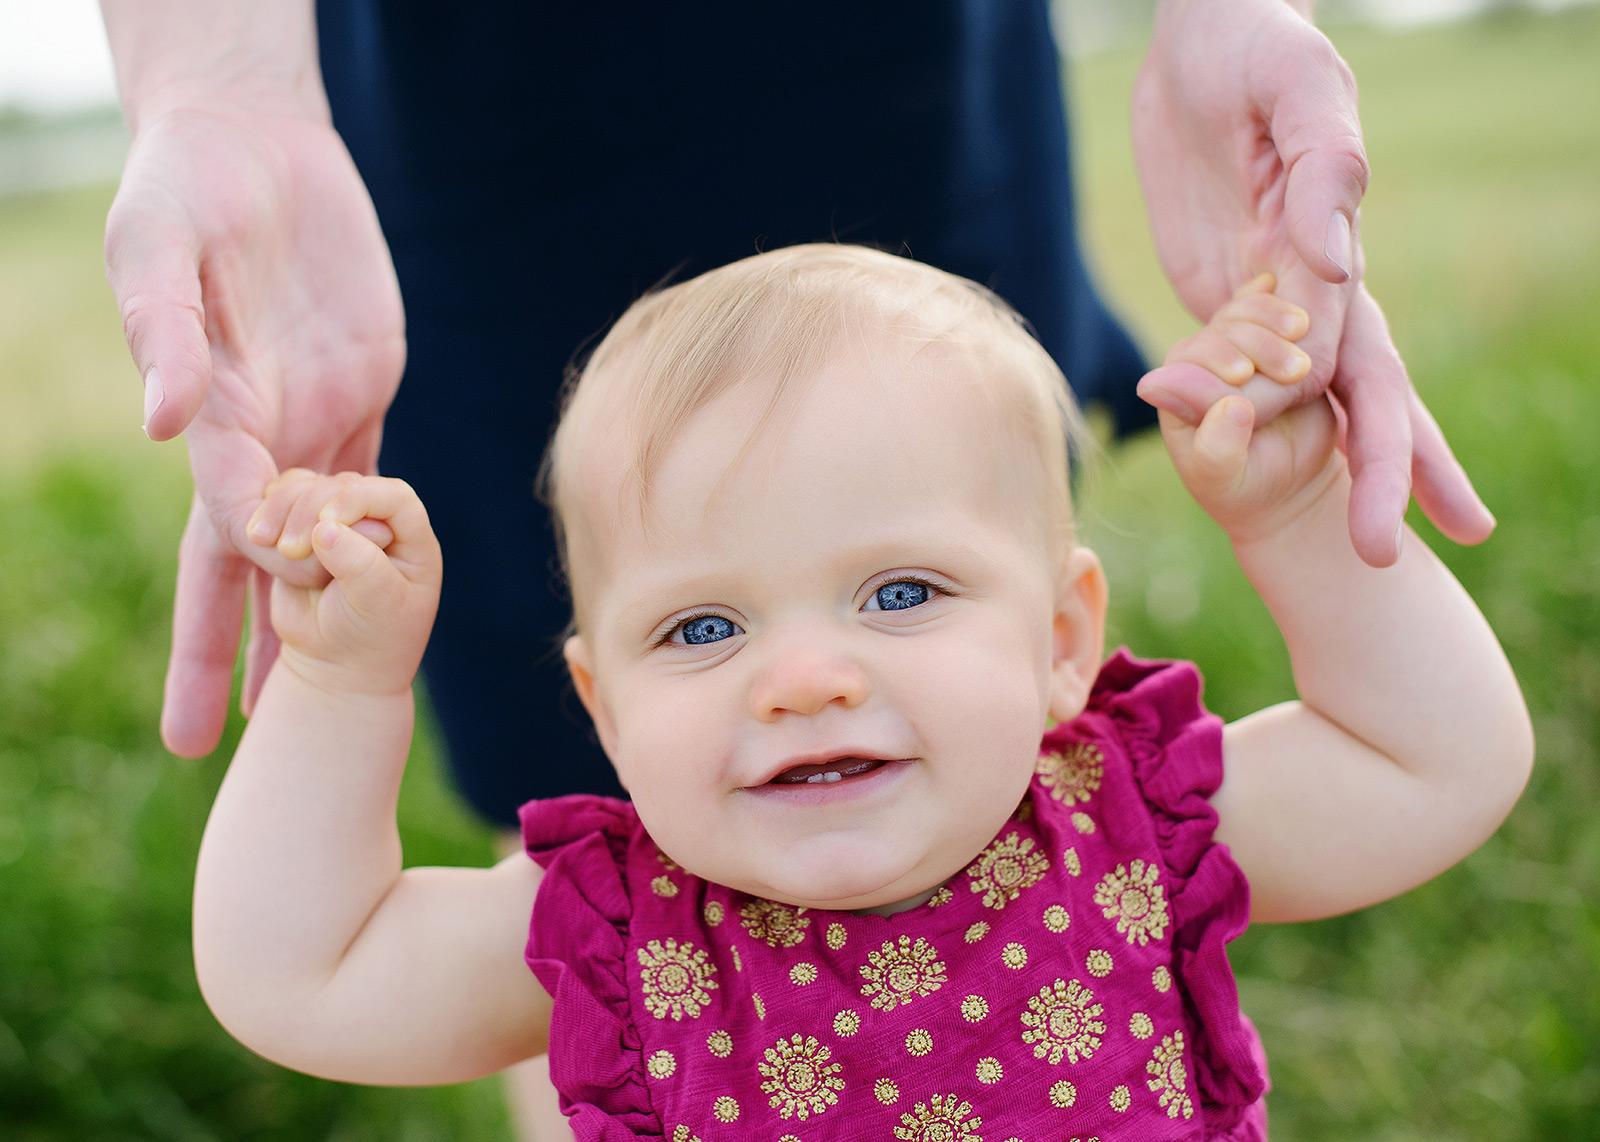 baby girl pink dress big blue eyes child portraits